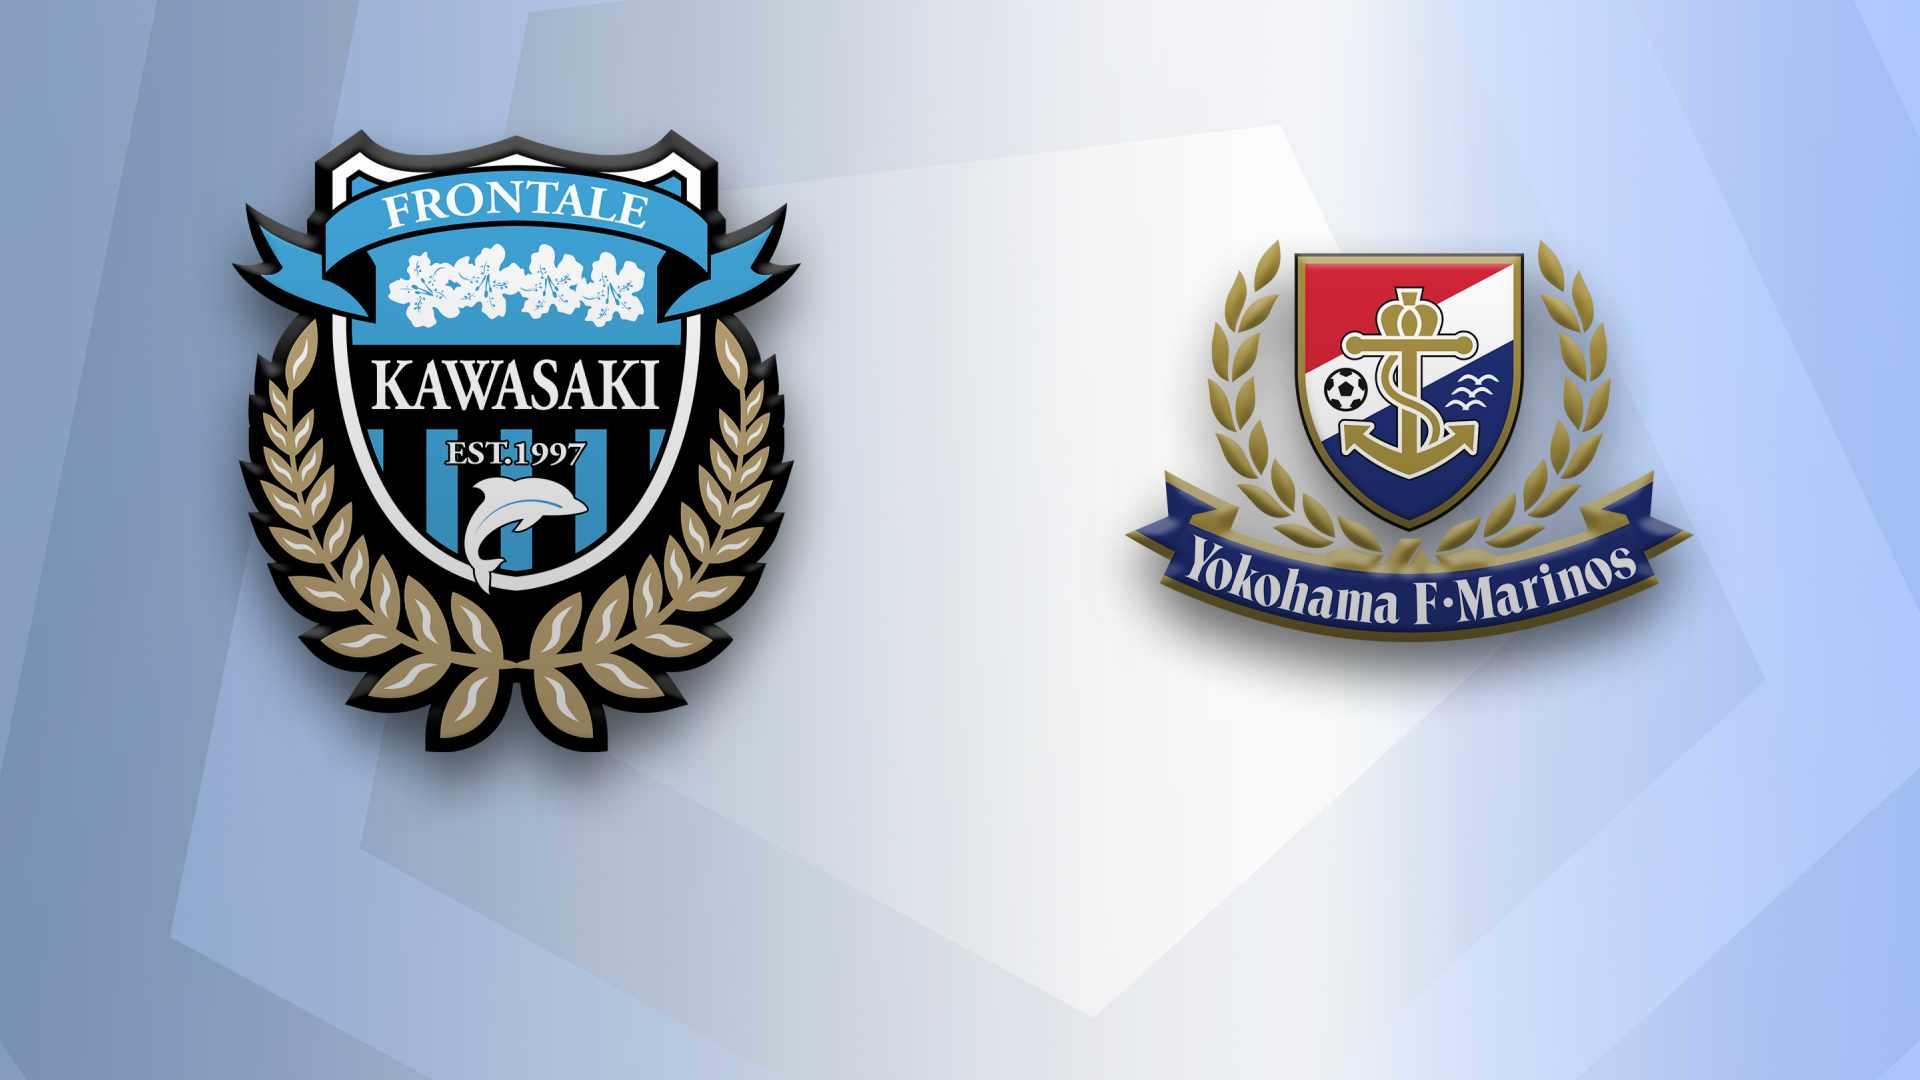 Kawasaki Frontale - Yokohama F-Marinos 26.02.2021 um 09:55 Uhr auf Sportdigital